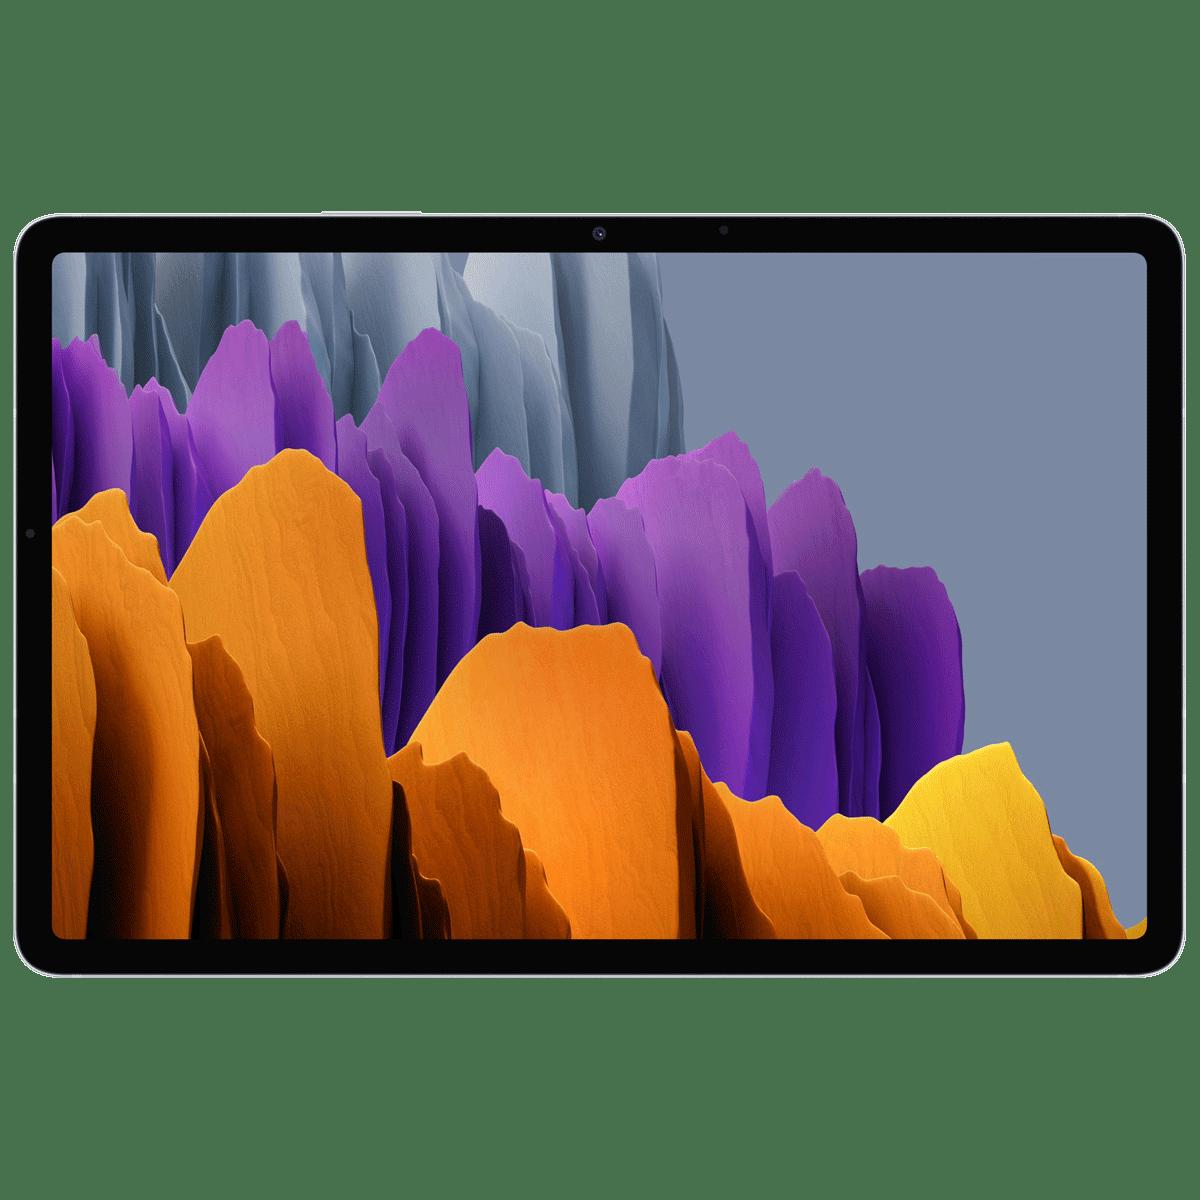 Samsung Galaxy Tab S7 Plus WiFi Android Tablet (Android 10, Qualcomm Snapdragon 865 Plus, 31.50 cm (12.4 Inches), 6GB RAM, 128GB ROM, SM-T970NZSAINU, Mystic Silver)